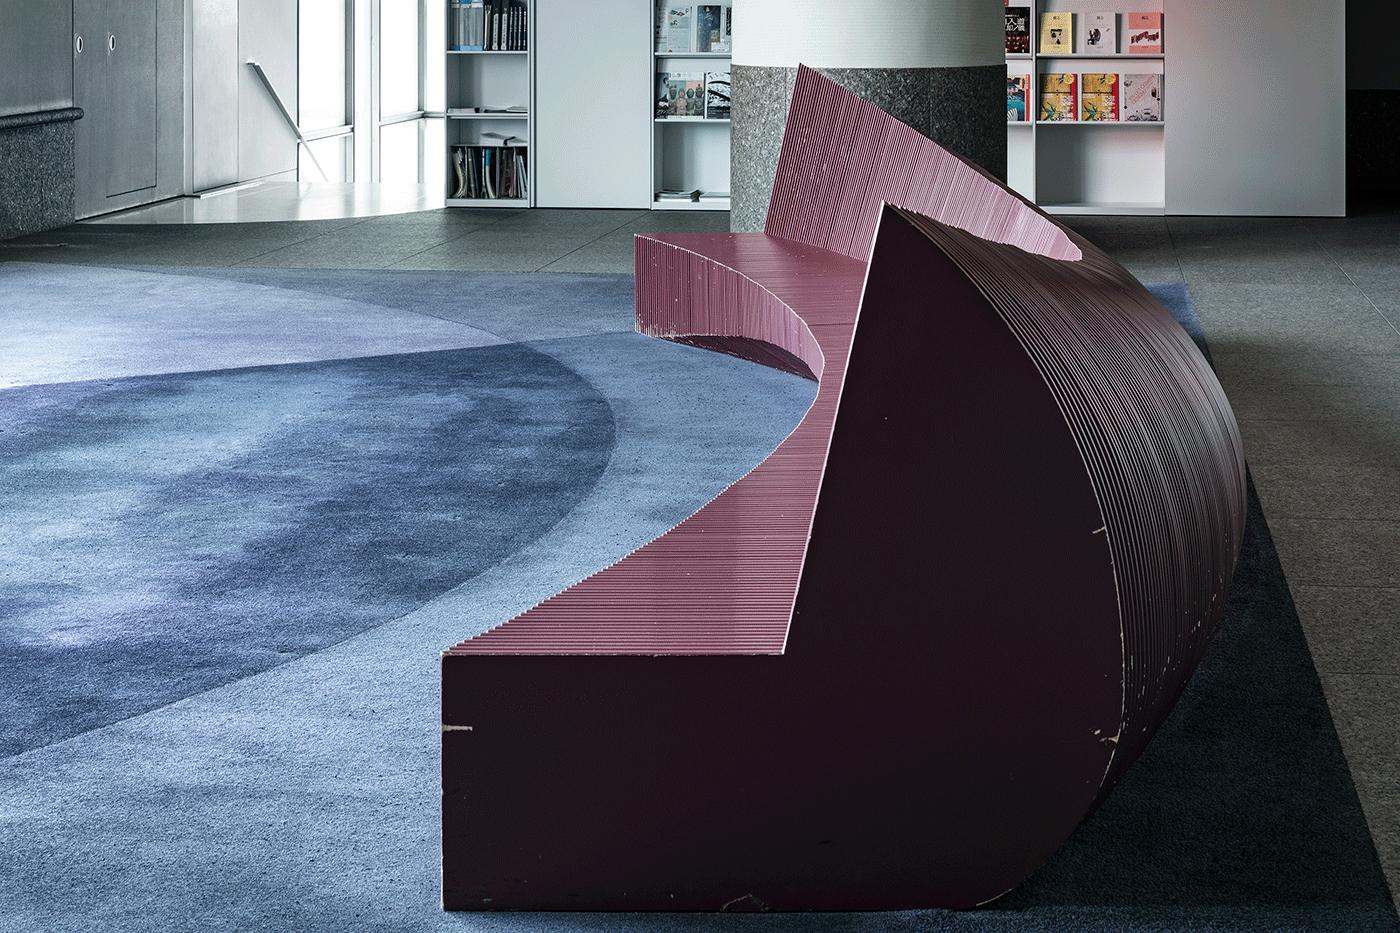 Furniture by Fujie Kazuko. Photo by Hasegawa Kenta